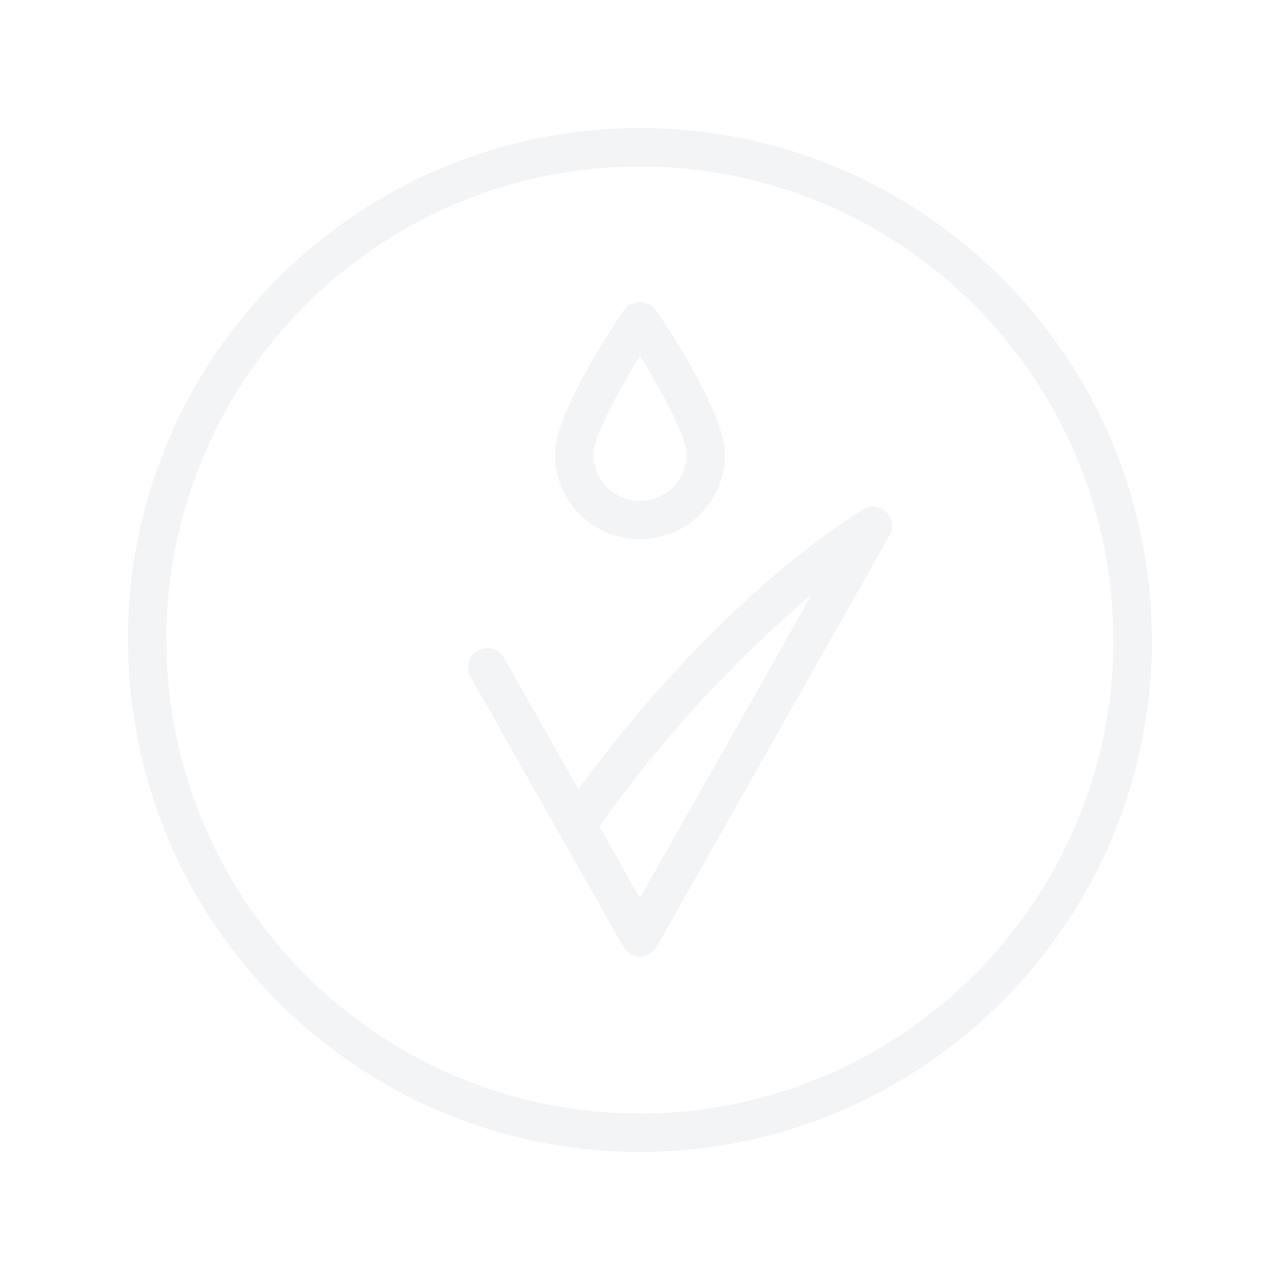 MILANI Amore Mattallics Lip Cream 5g